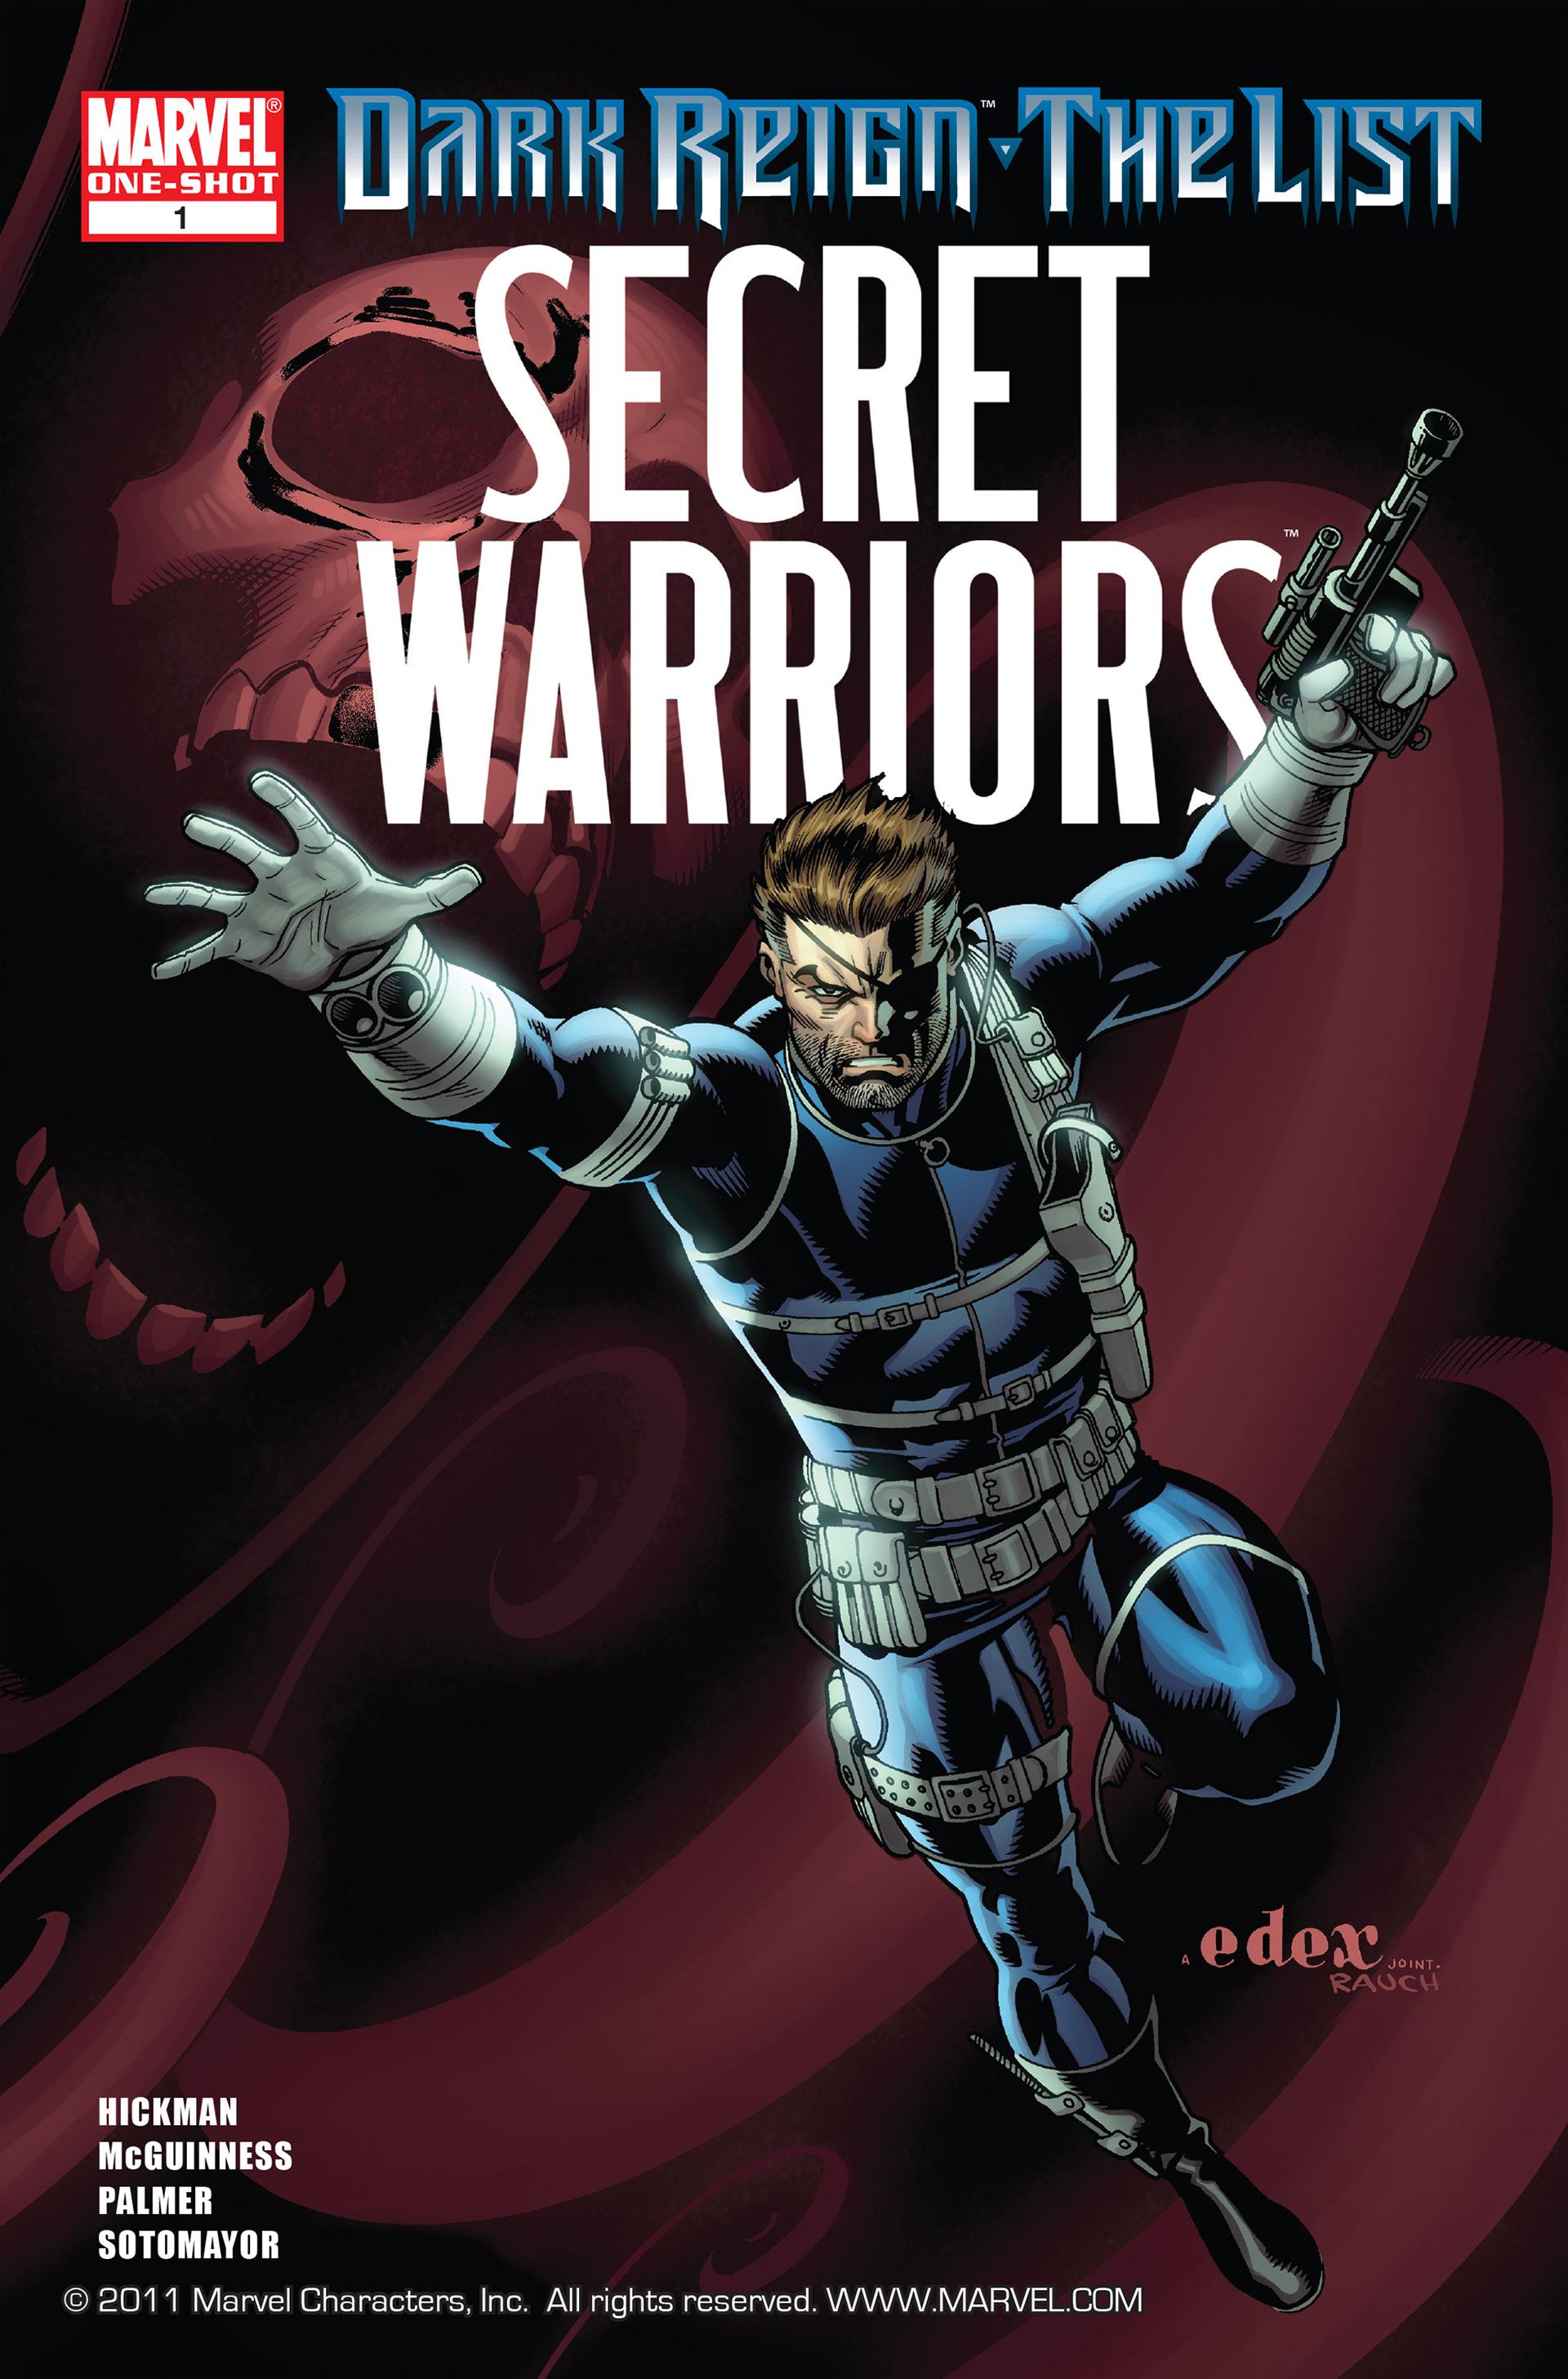 Dark Reign: The List - Secret Warriors Full Page 1